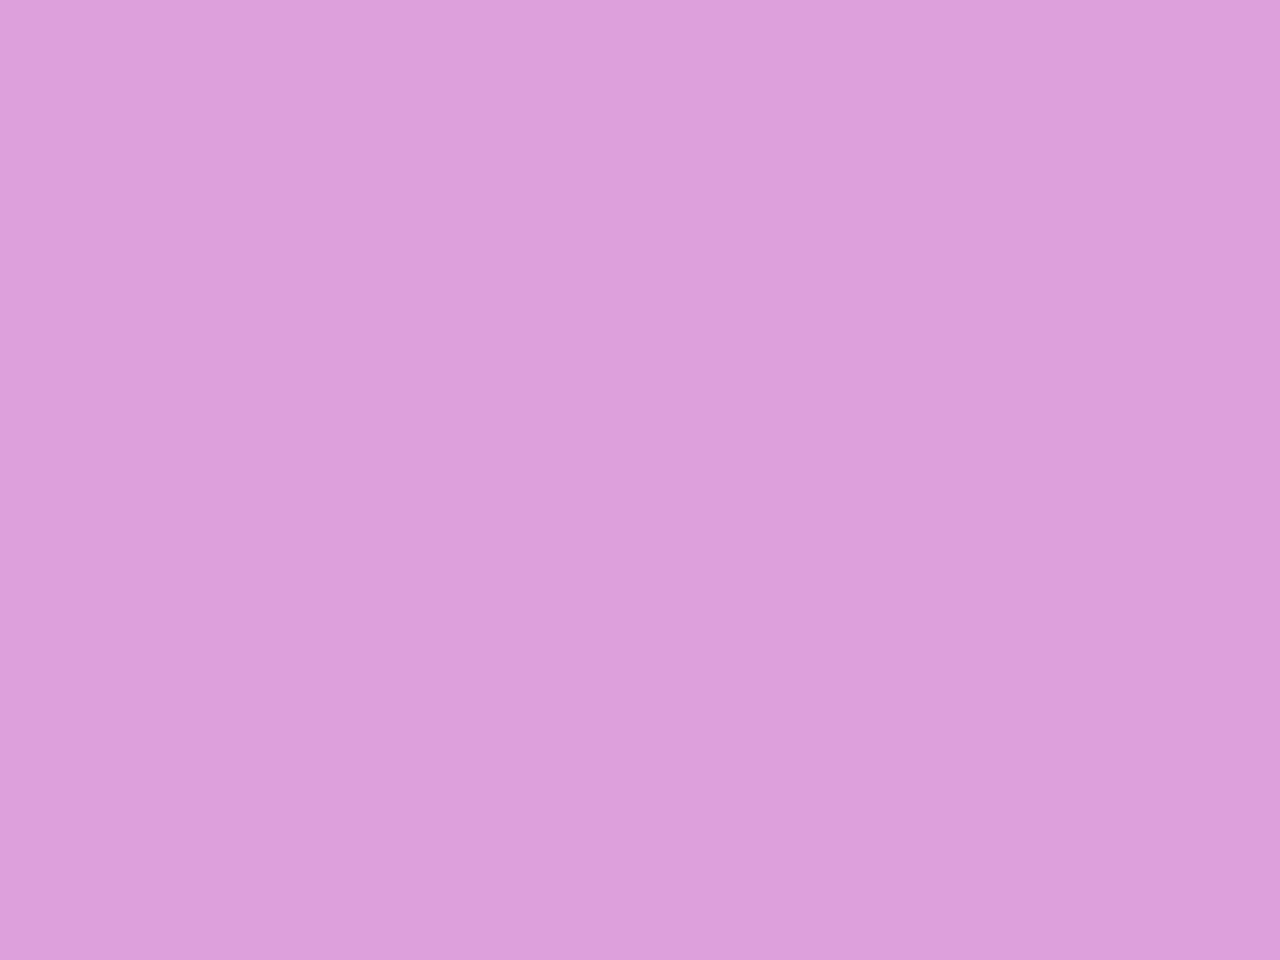 1280x960 Pale Plum Solid Color Background